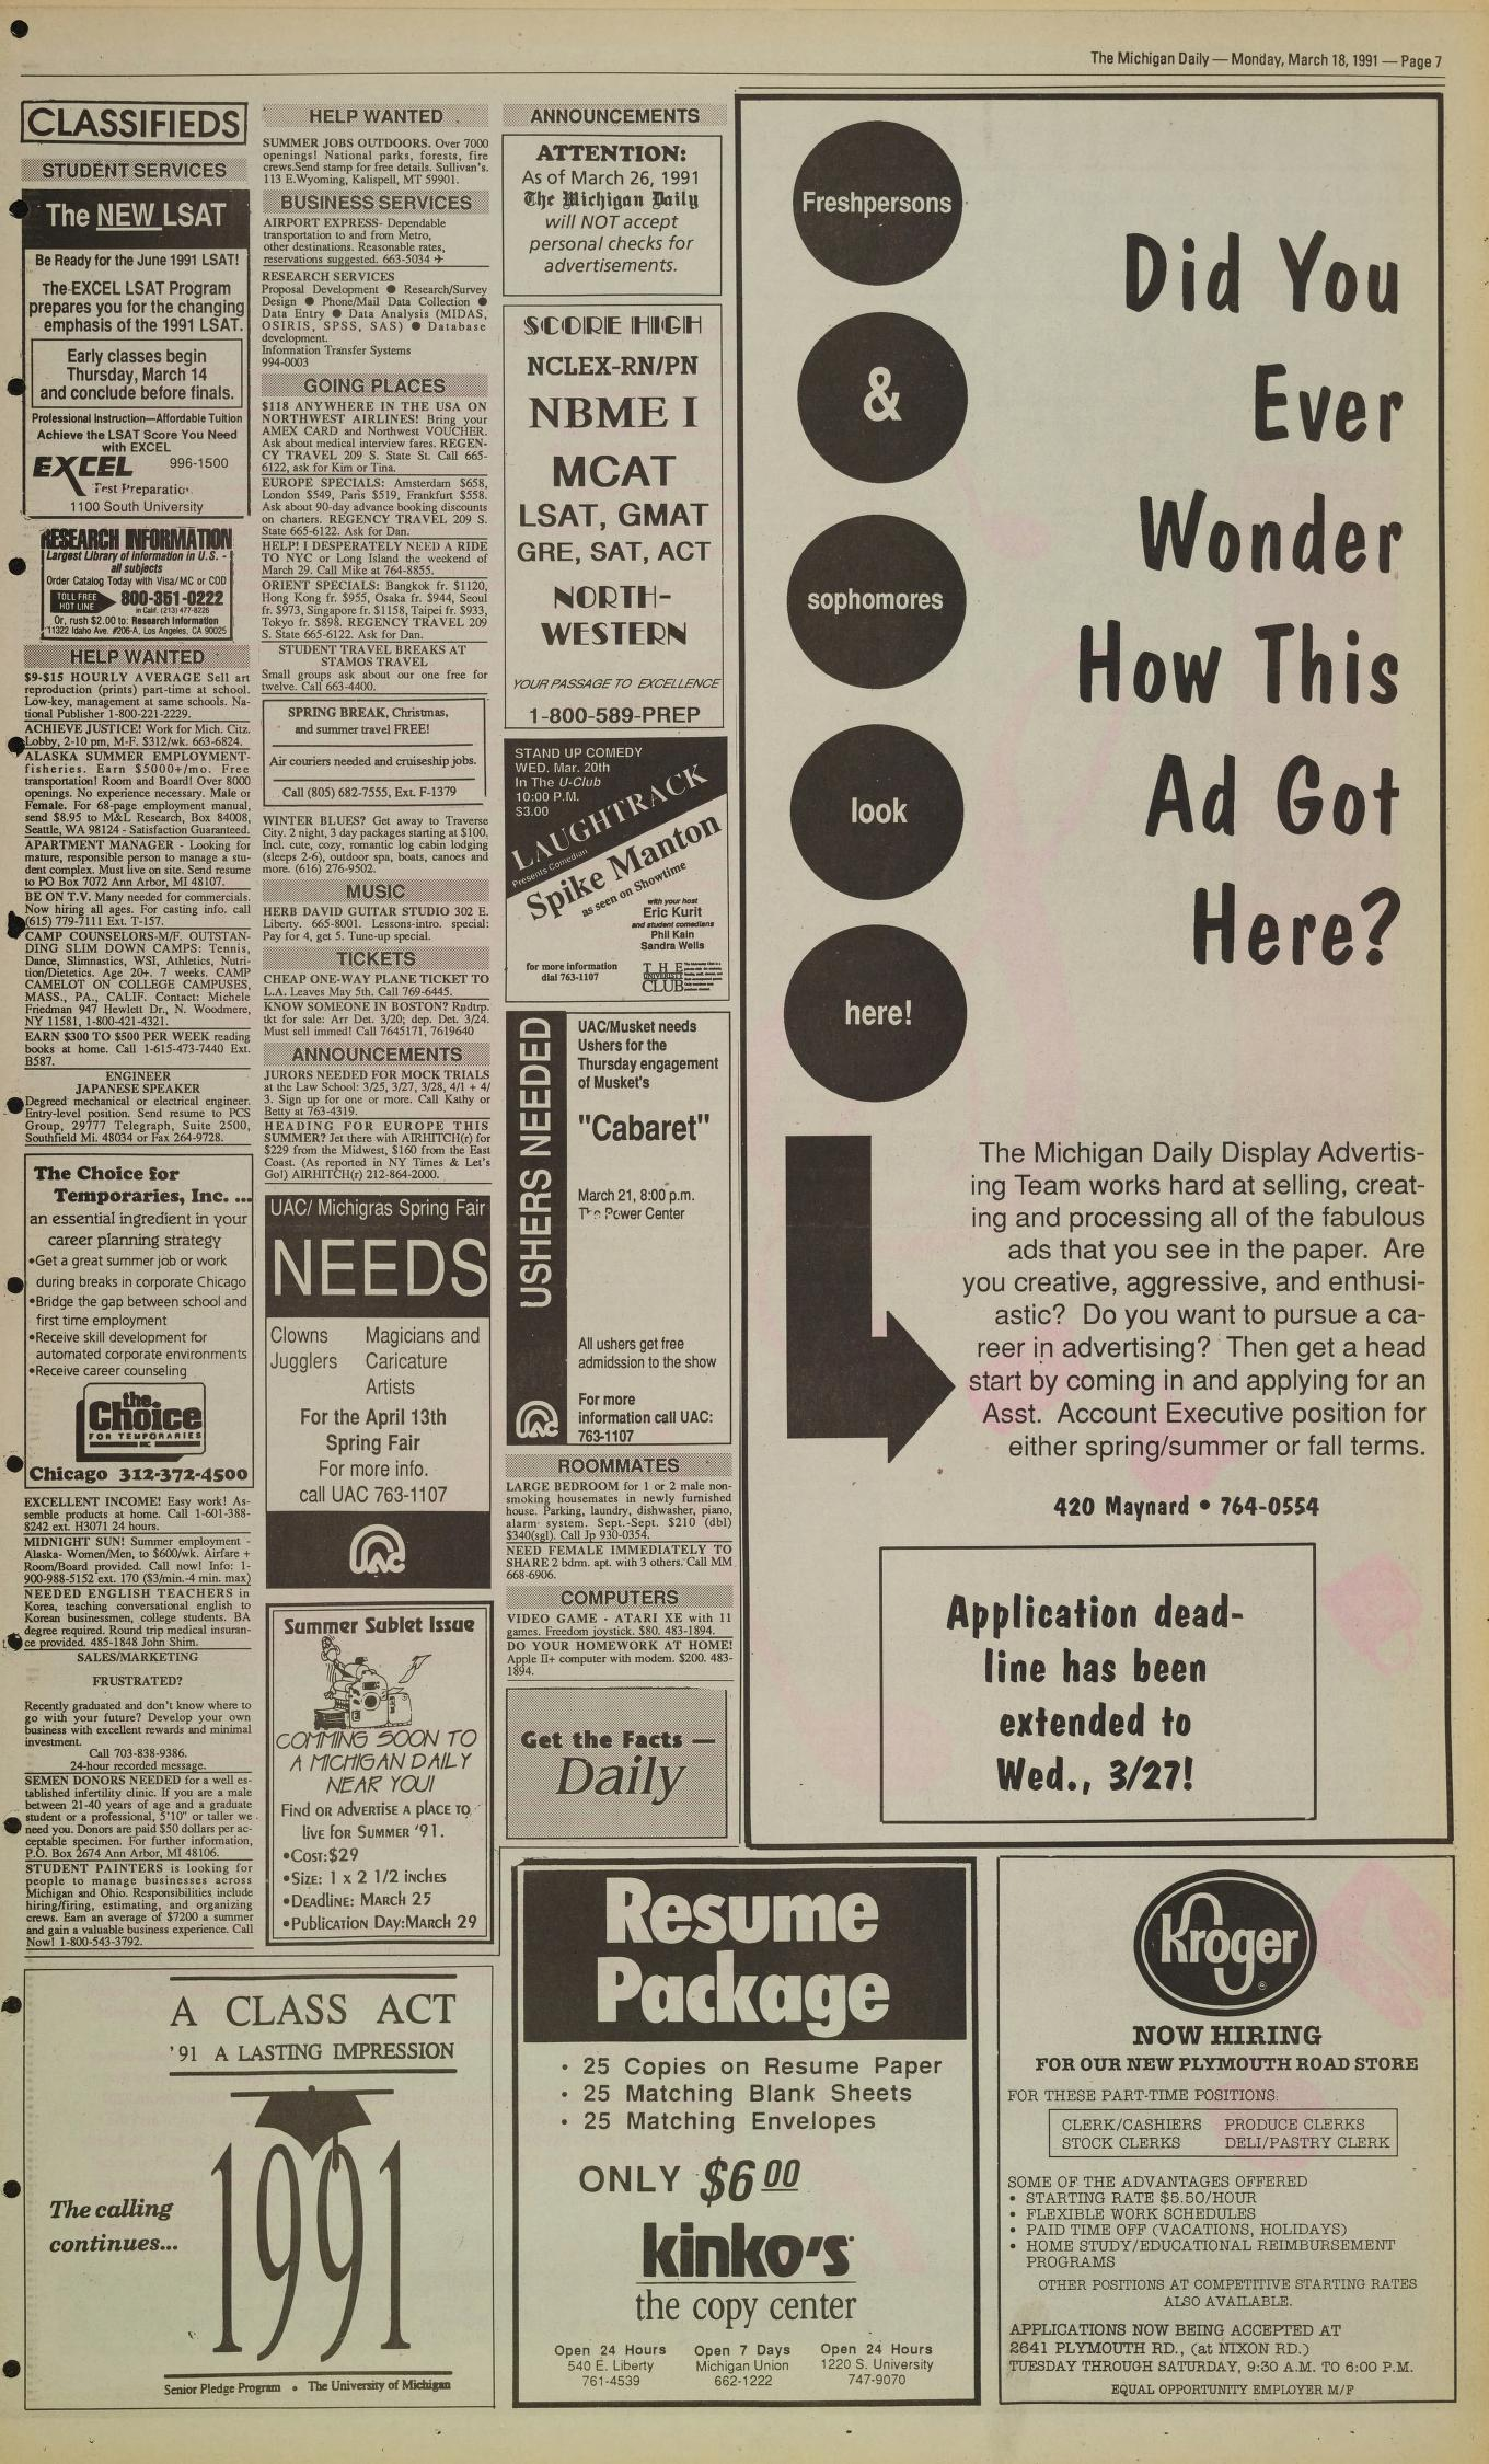 Michigan Daily Digital Archives - March 18, 1991 (vol  101